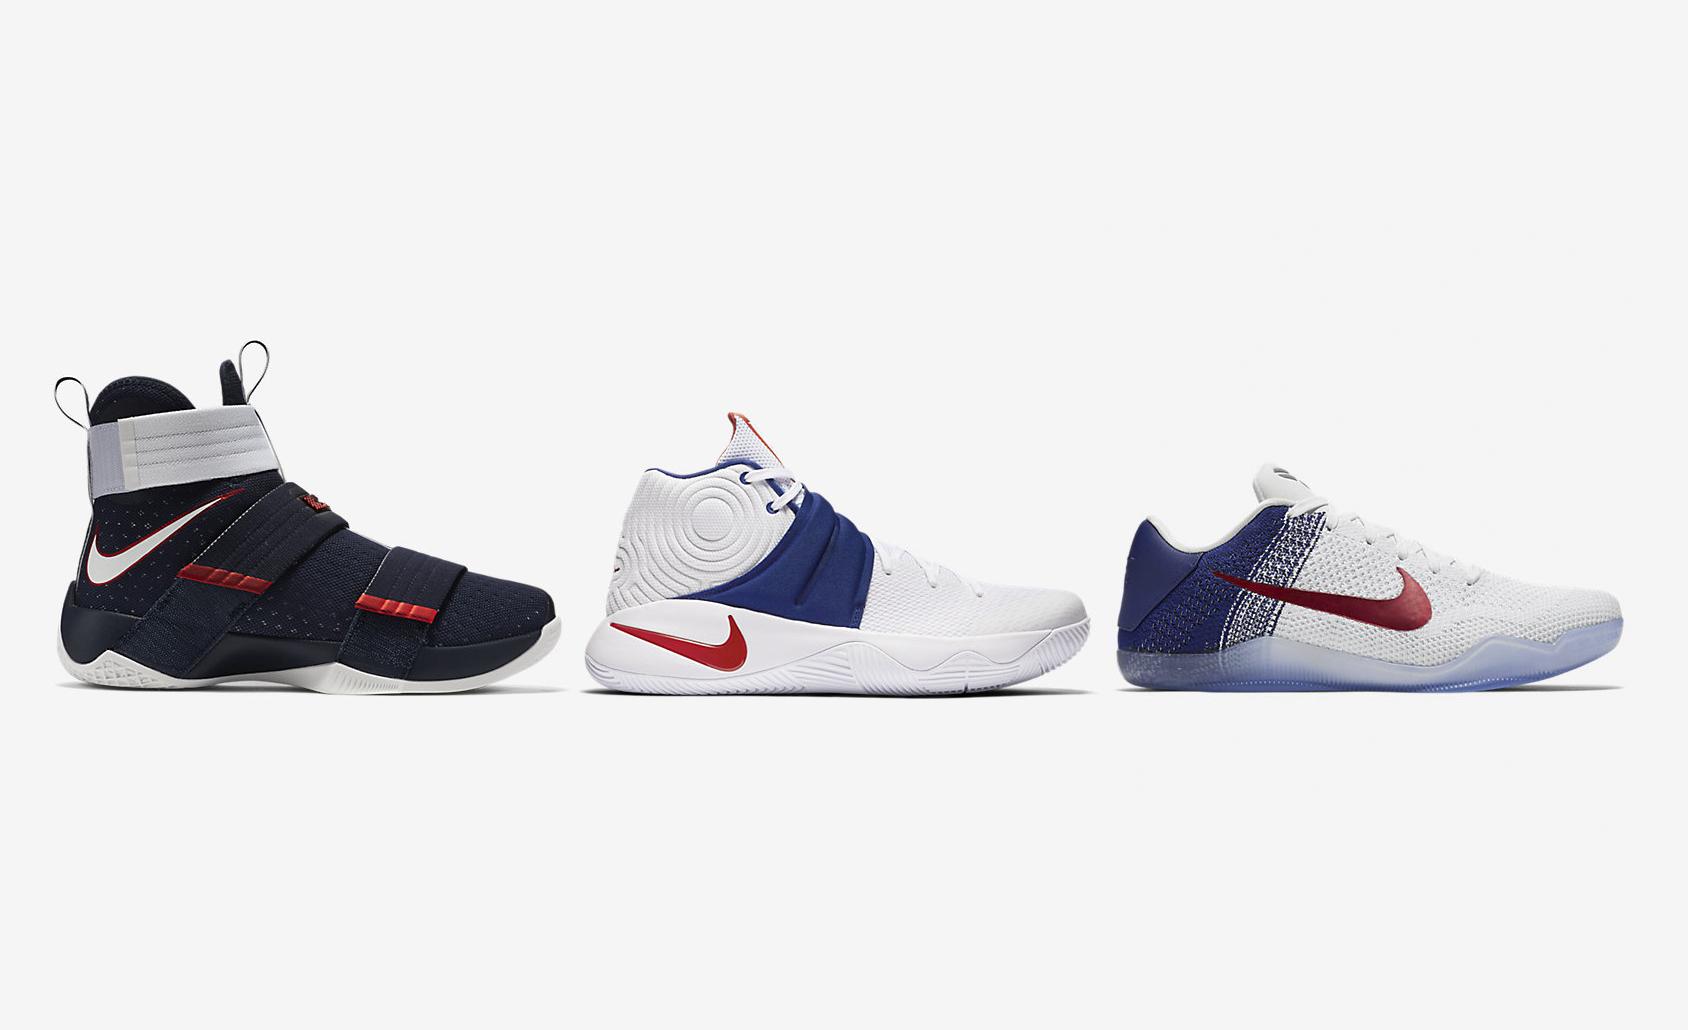 buy popular 07629 fd7a4 2016 Nike Basketball 'USA' Pack (Kobe 11, Kyrie 2, LeBron ...